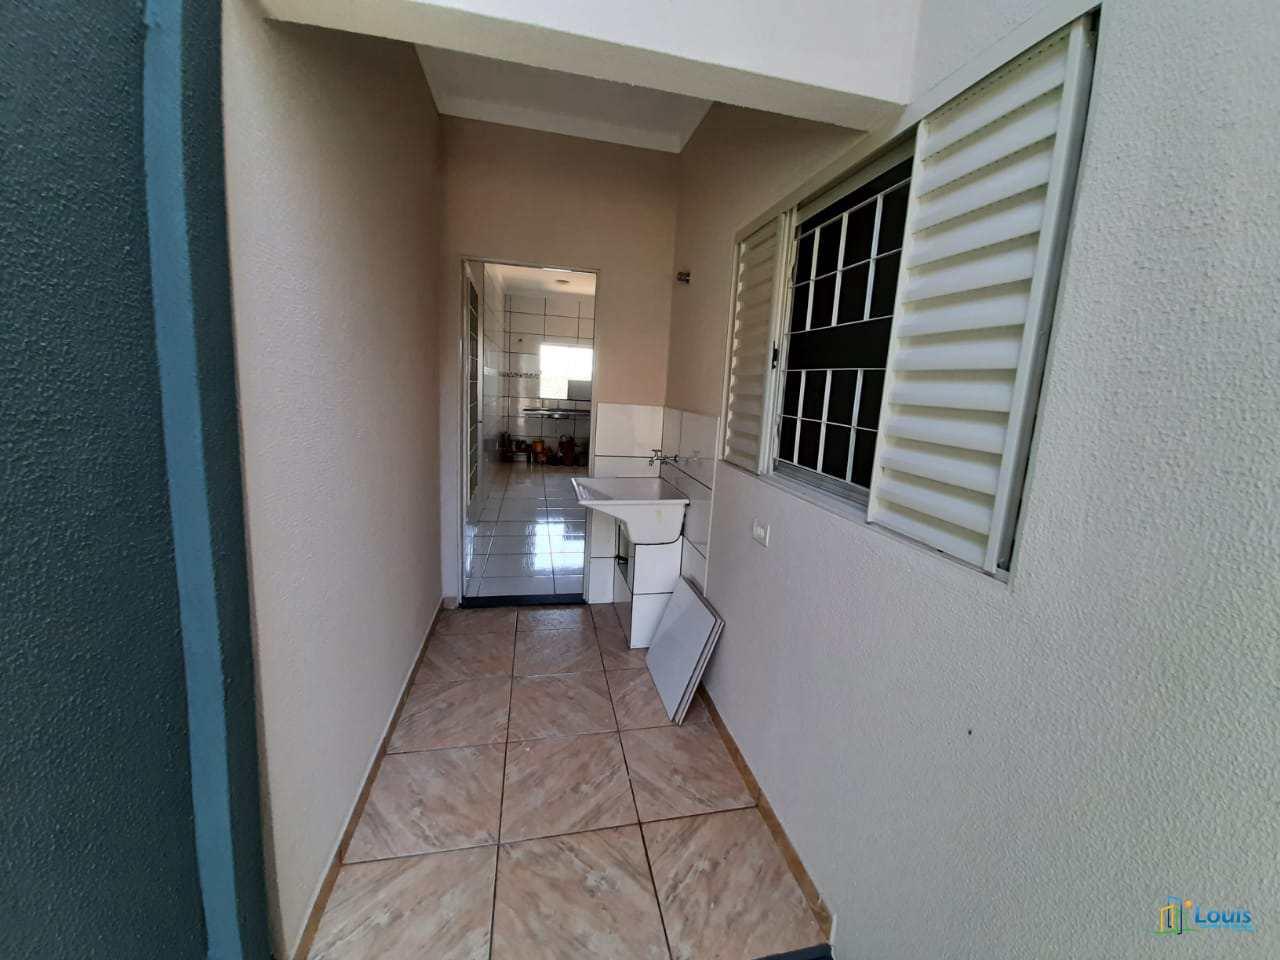 Casa Geminada, 2 Quartos, Terra Bonita - Ibiporã/PR